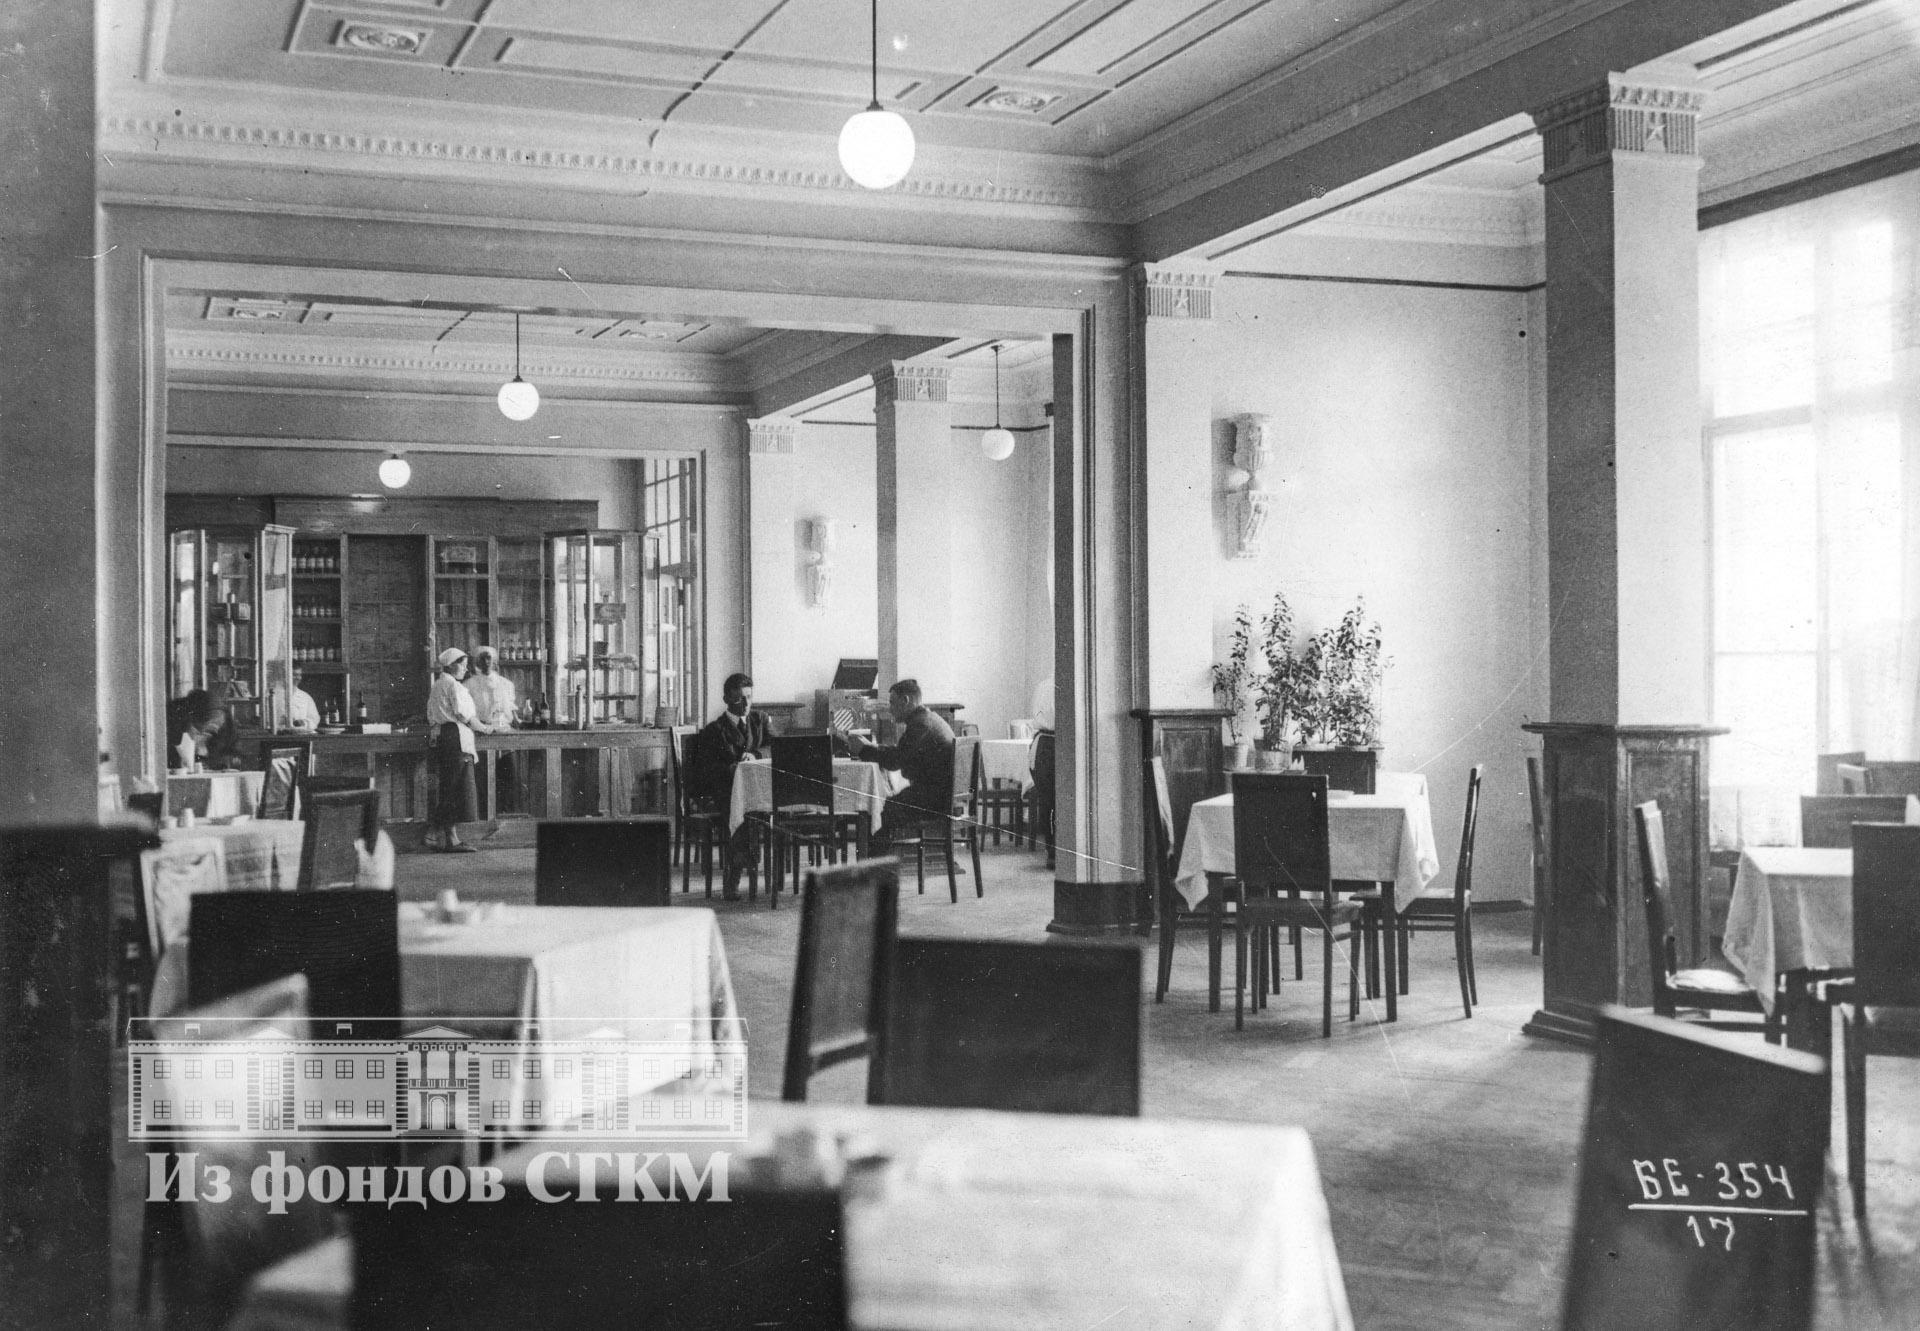 1939. Вид внутри столовой